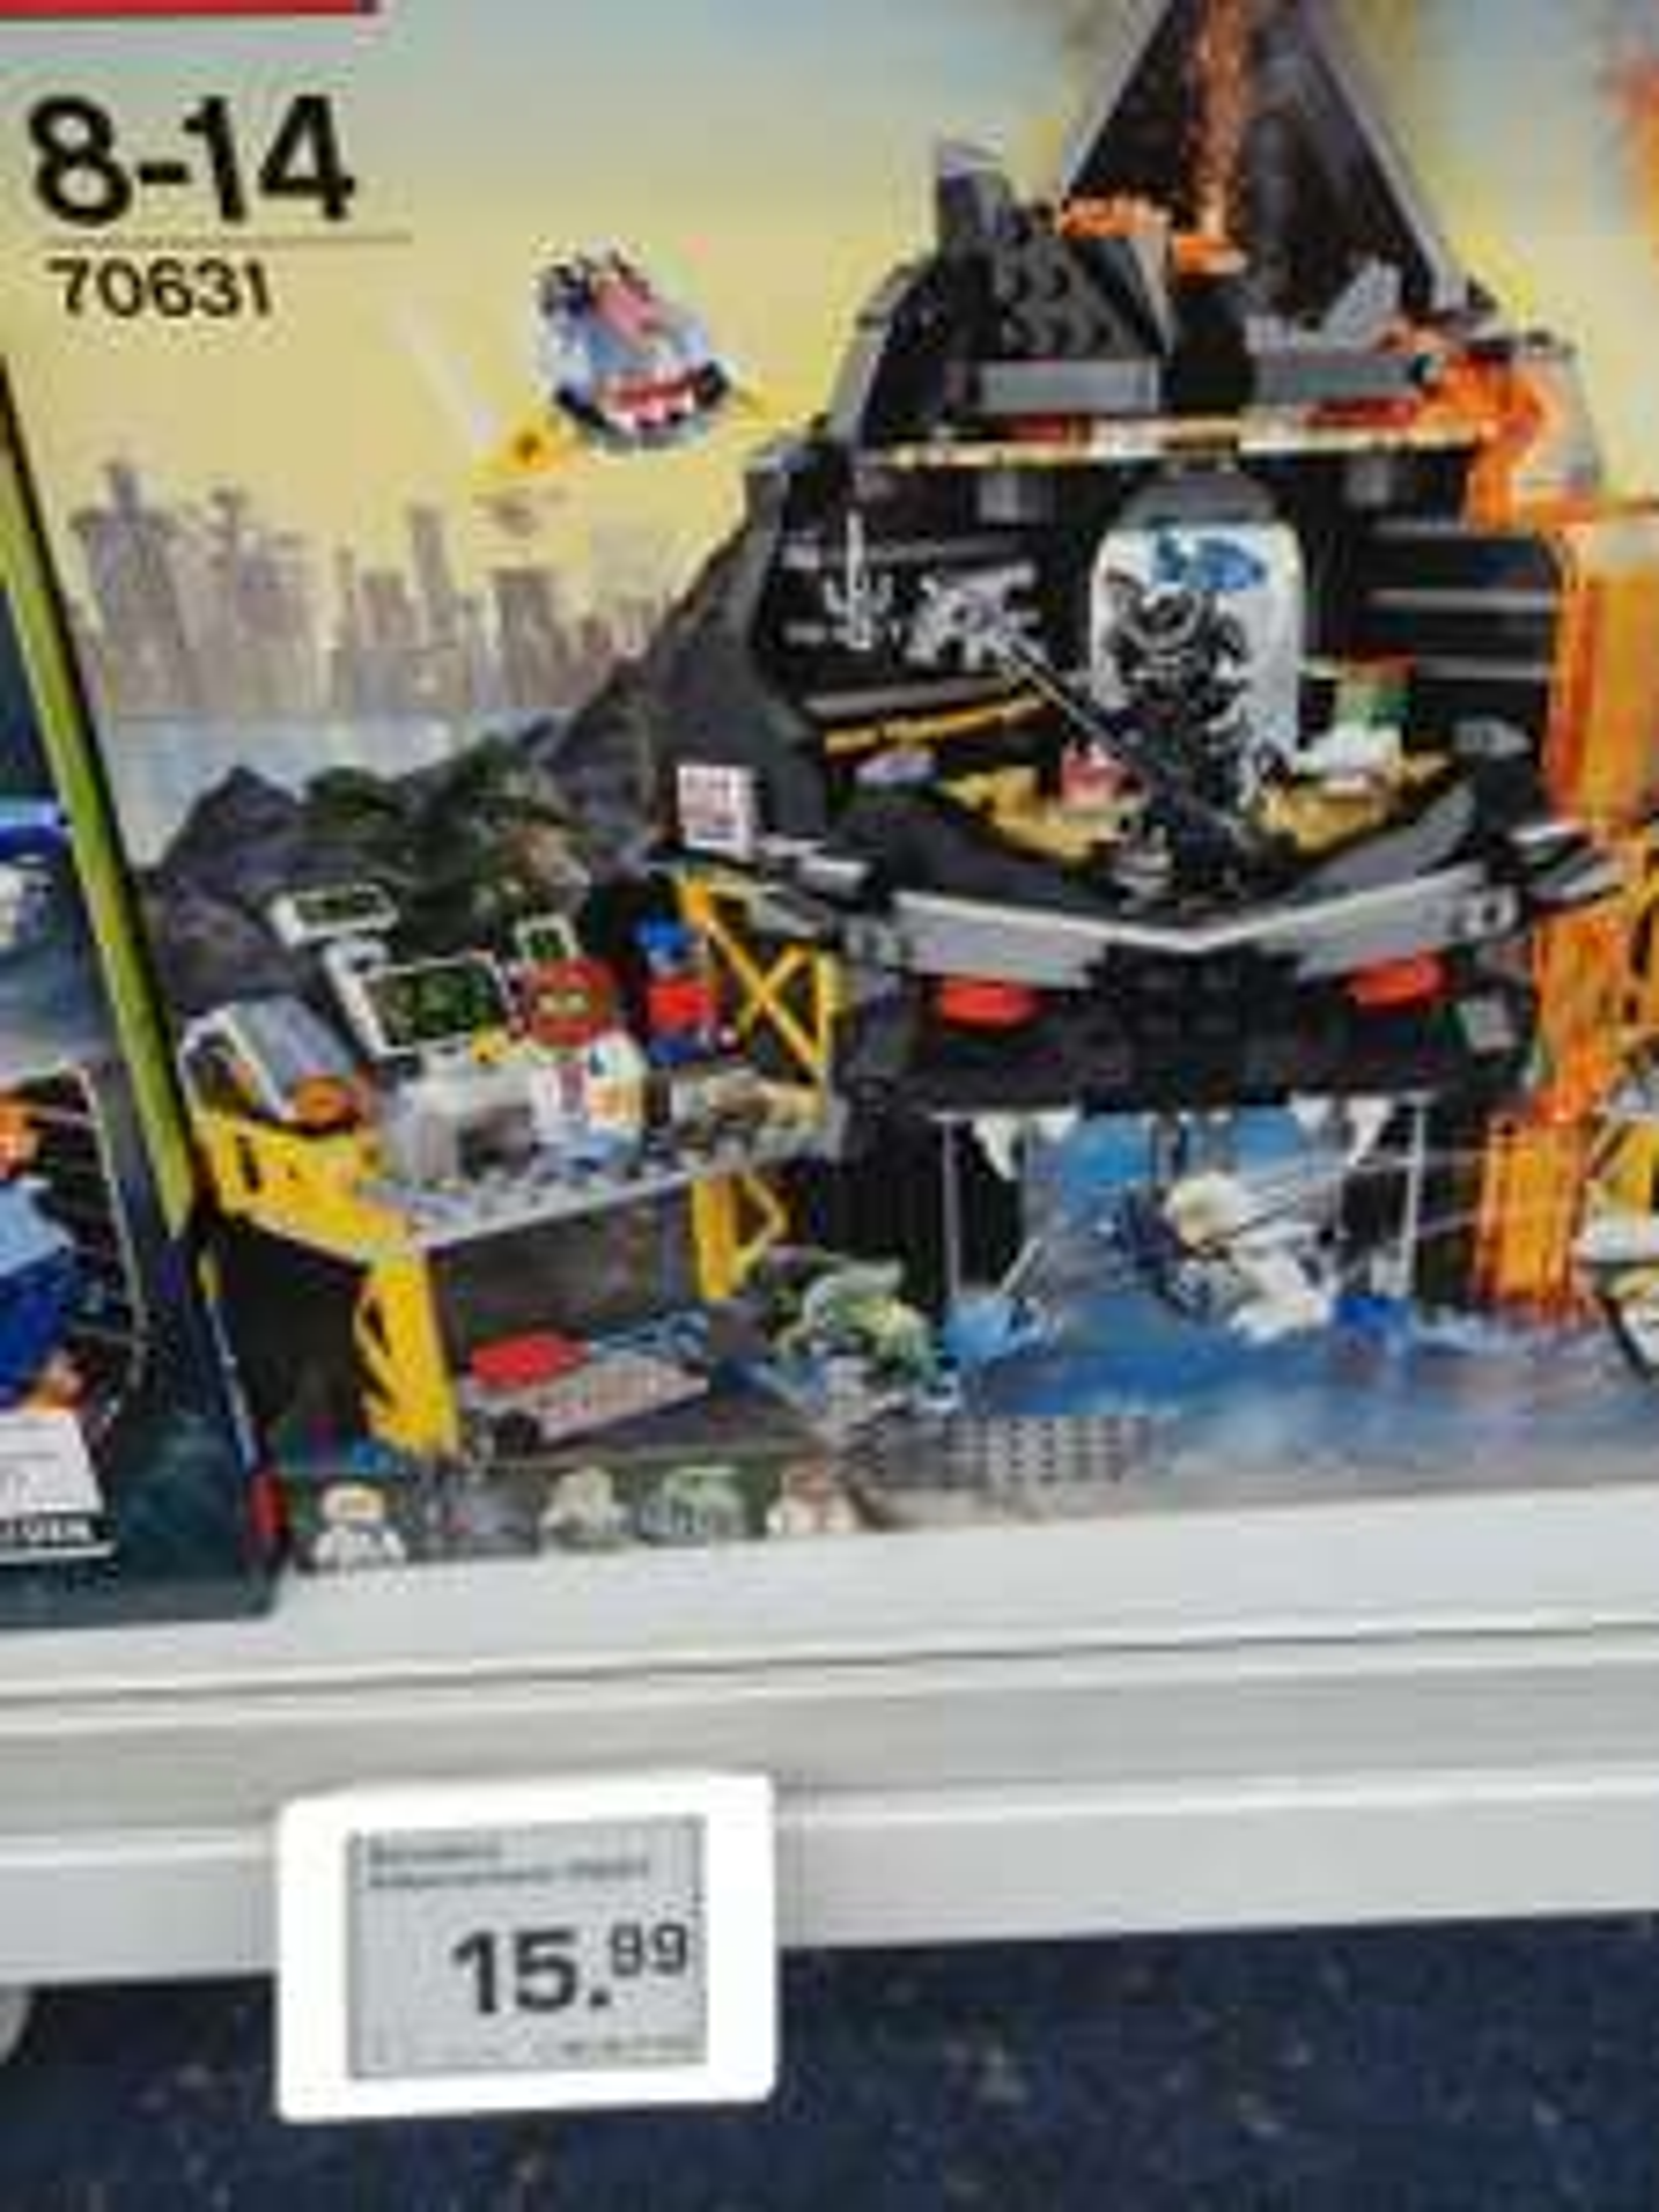 [Lokal Saturn Hamburg Hbf] LEGO Ninjago - Garmadons Vulkanversteck (70631)